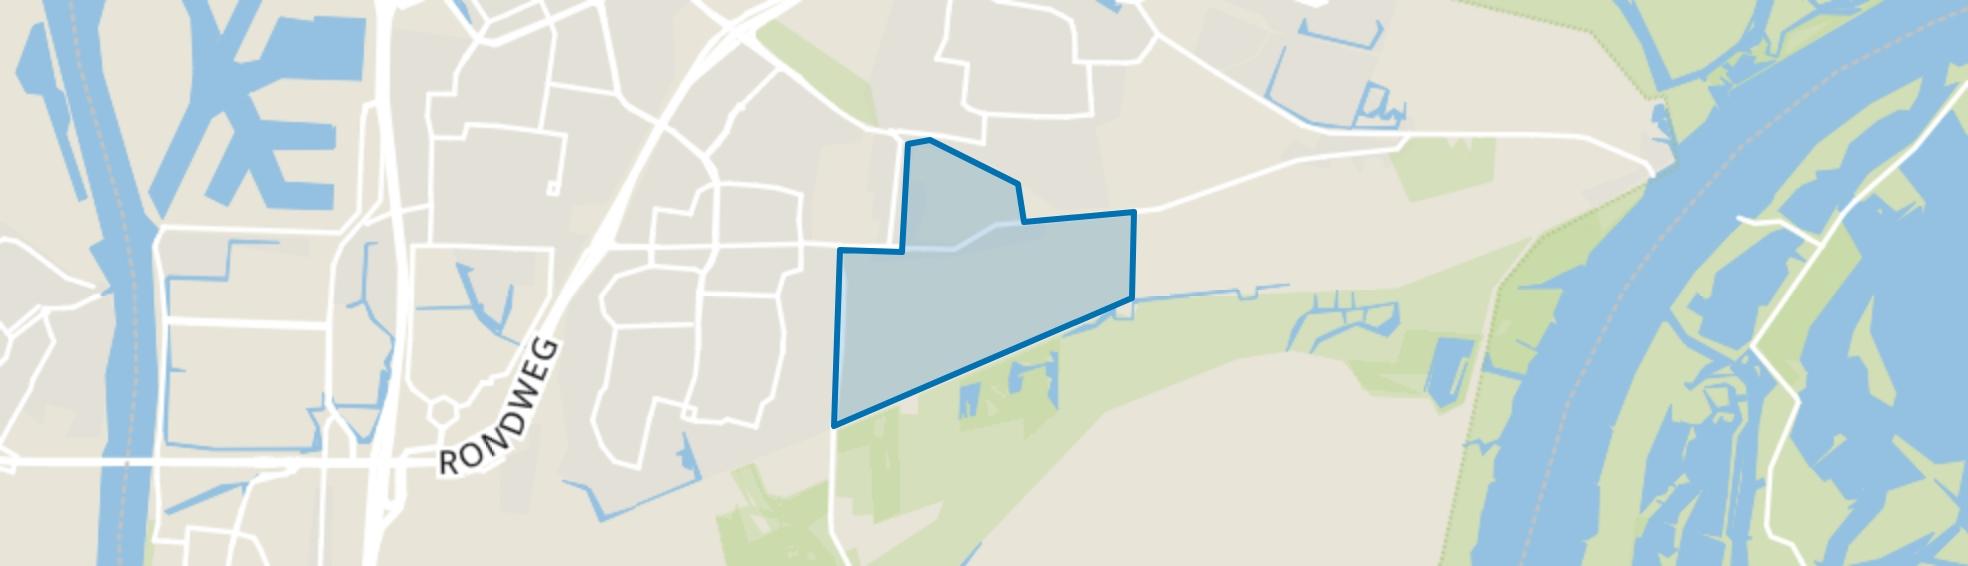 Belthure Park, Dordrecht map